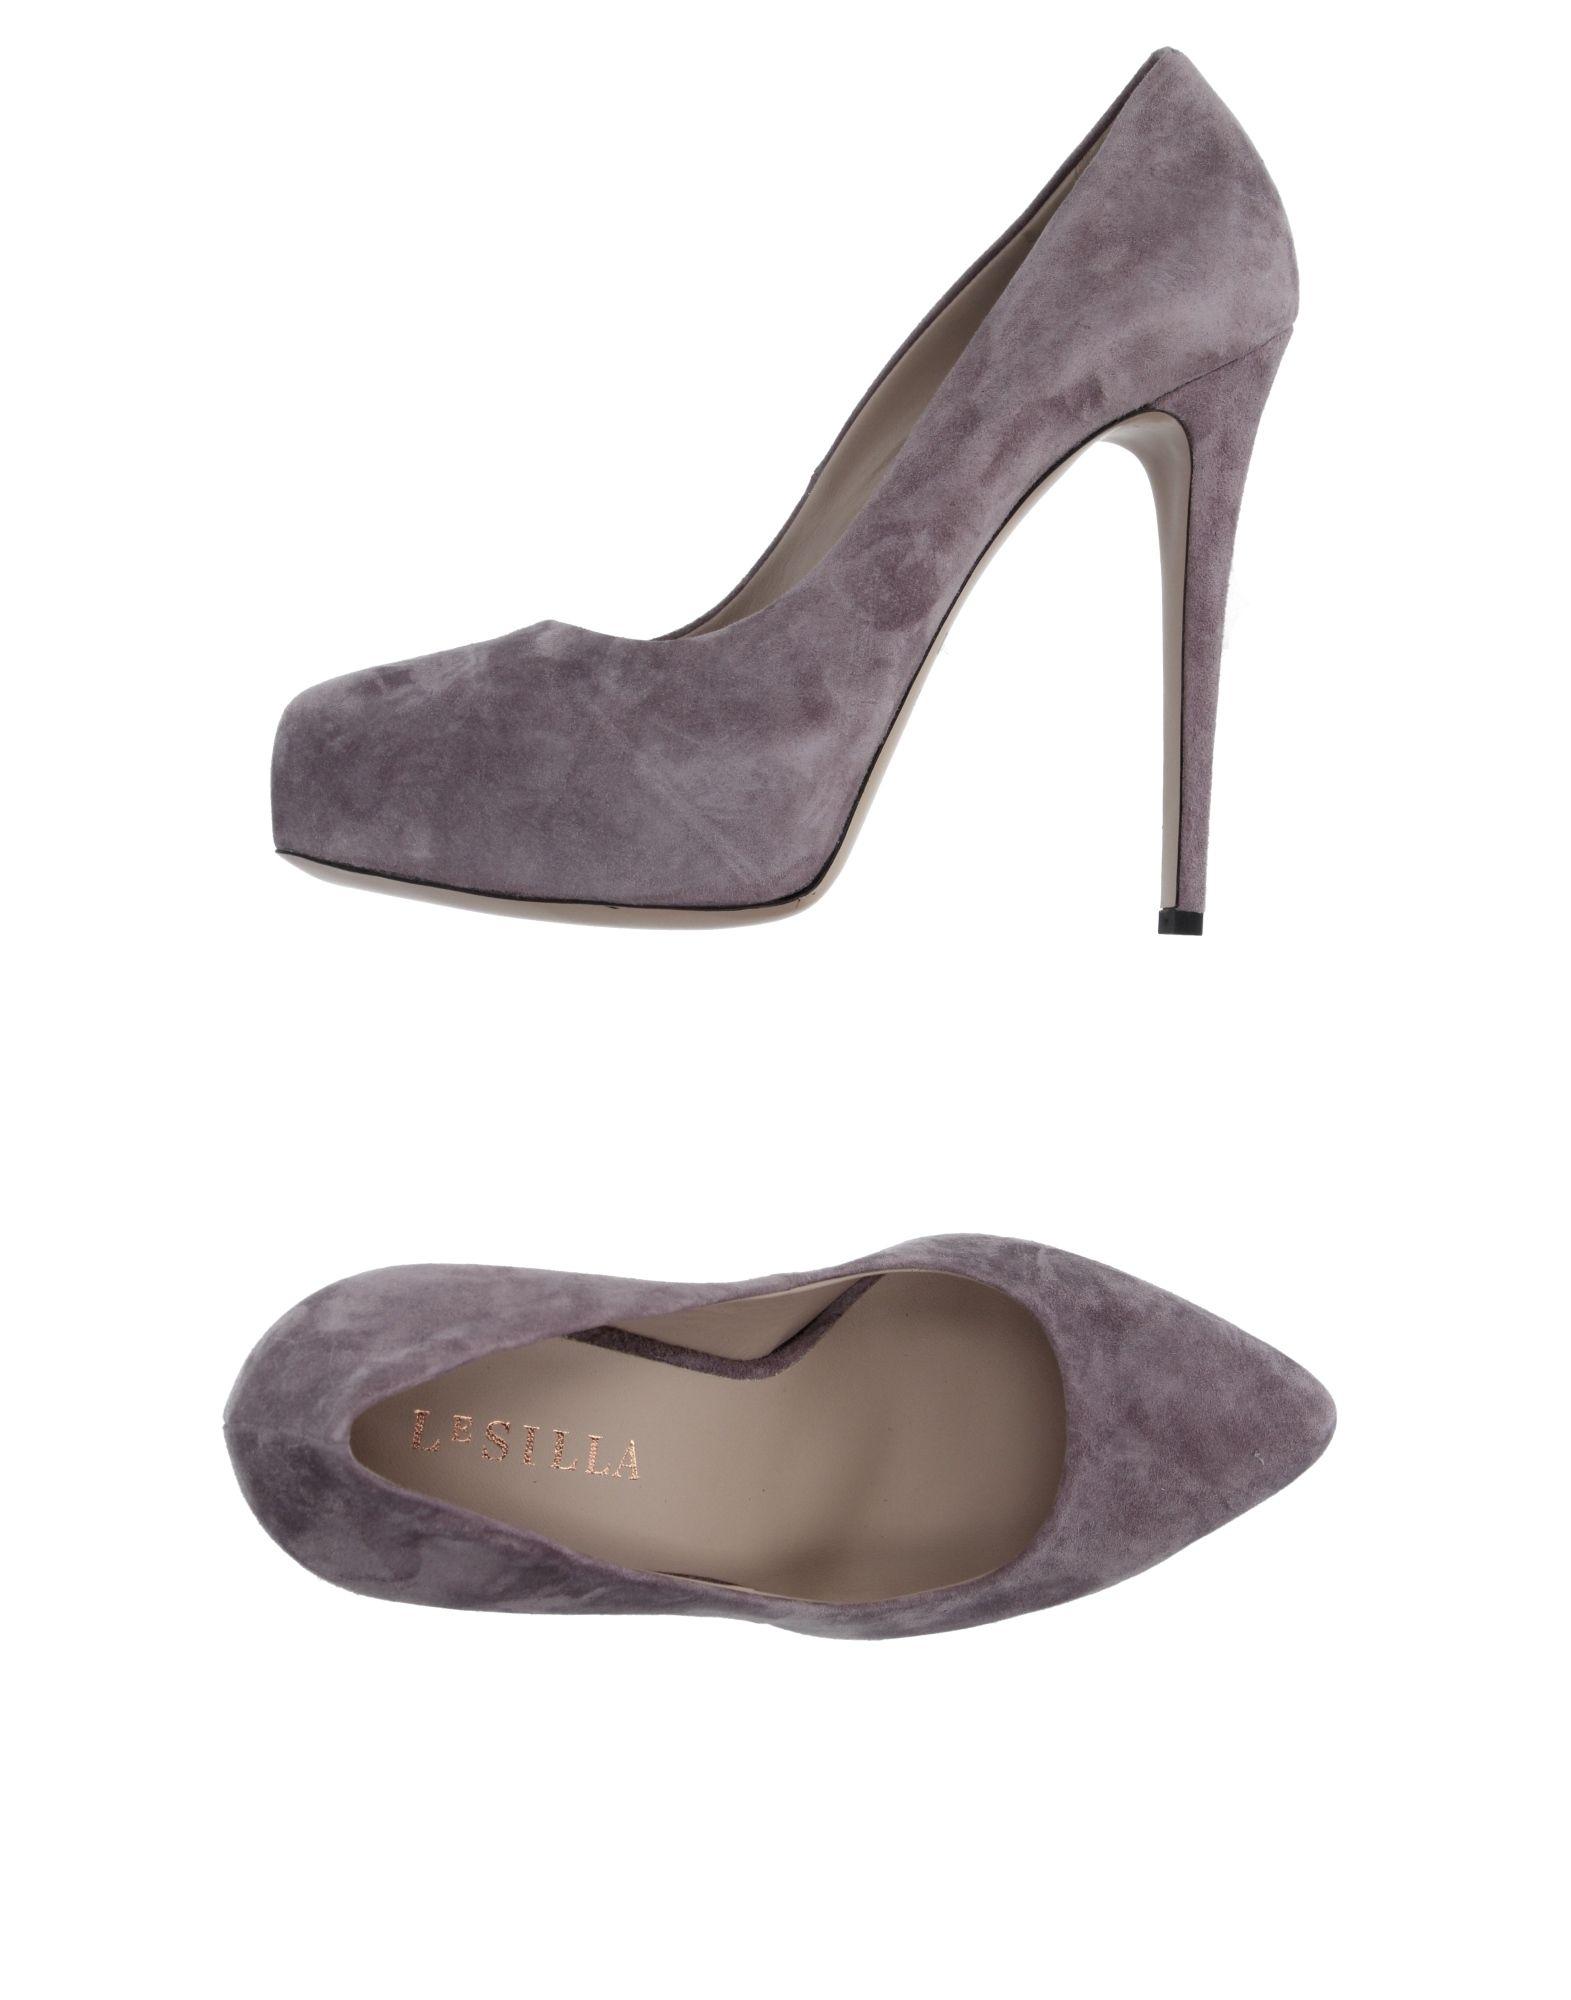 Rabatt Damen Schuhe Le Silla Pumps Damen Rabatt  11050465IT 781e95